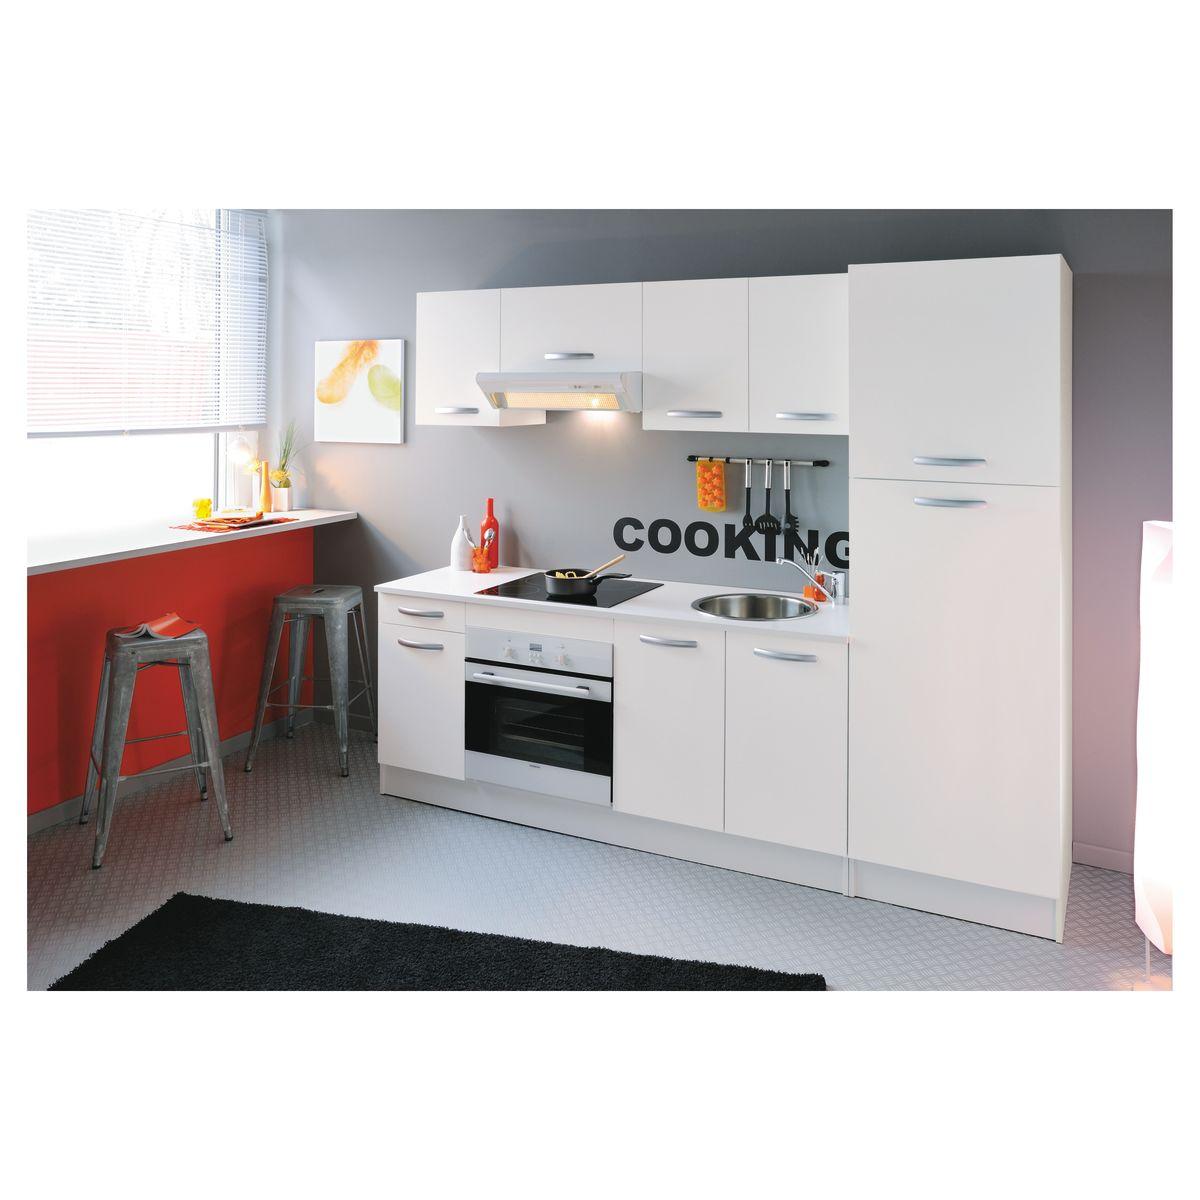 Leroy merlin cucine componibili cv37 regardsdefemmes - Cucine con prezzi ...